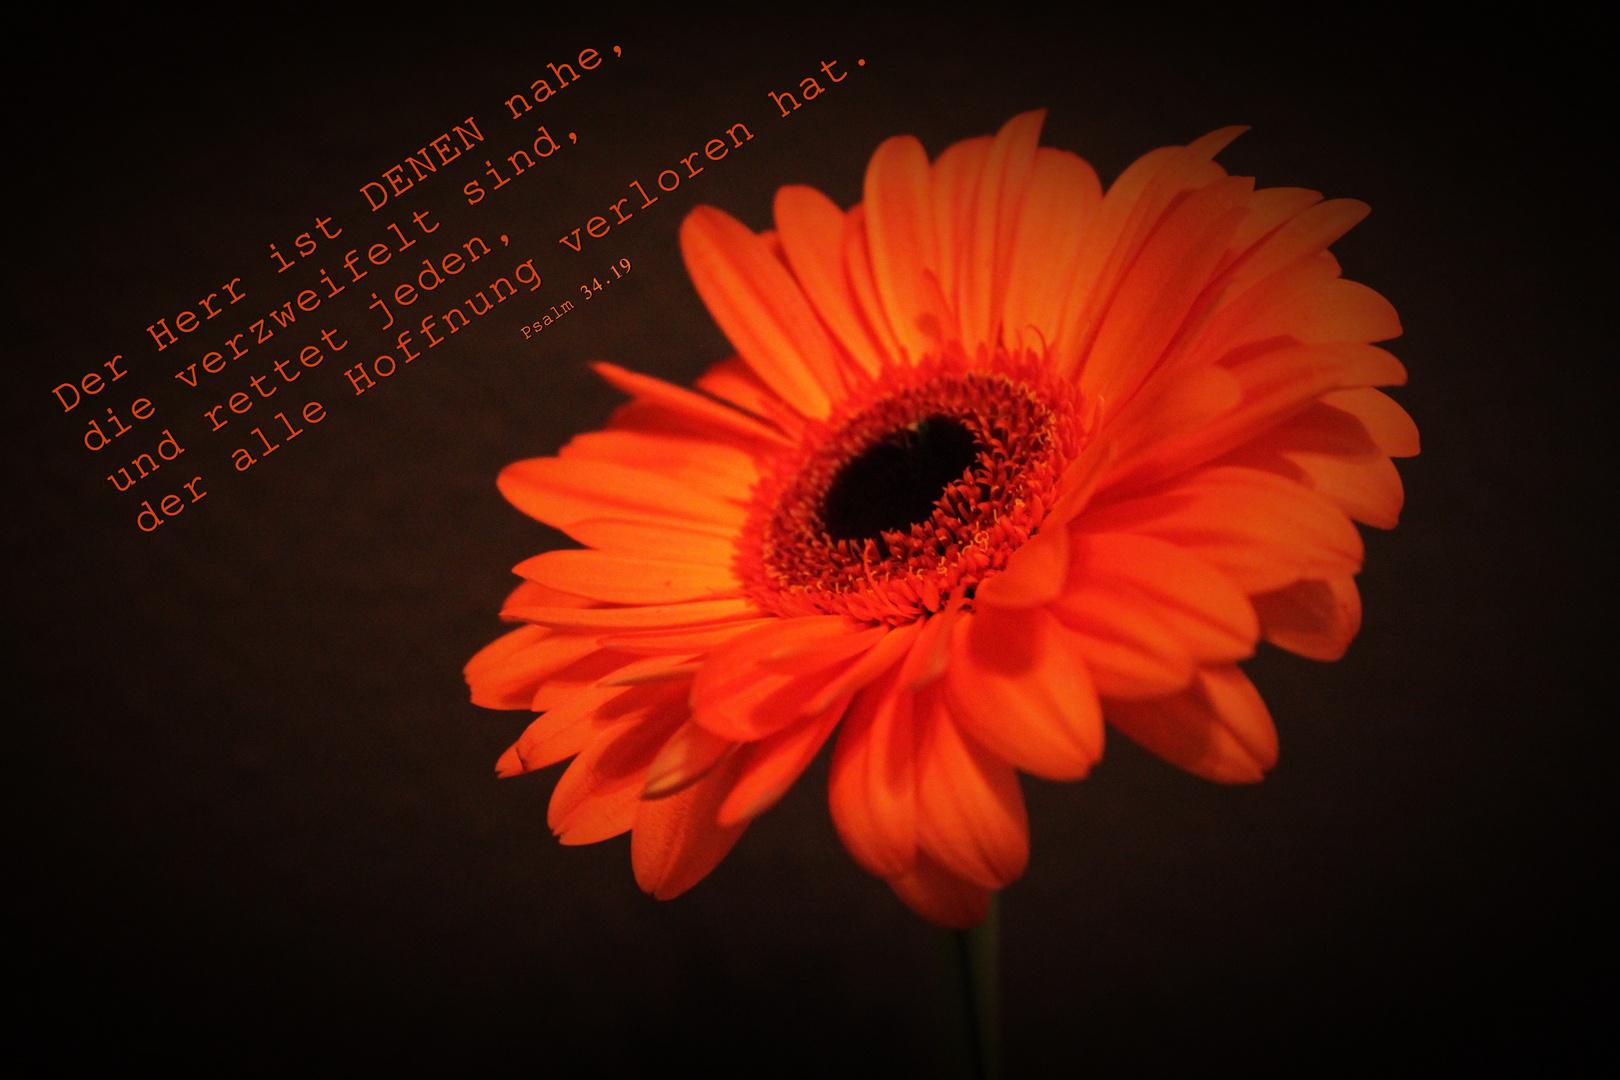 Psalm 34,19